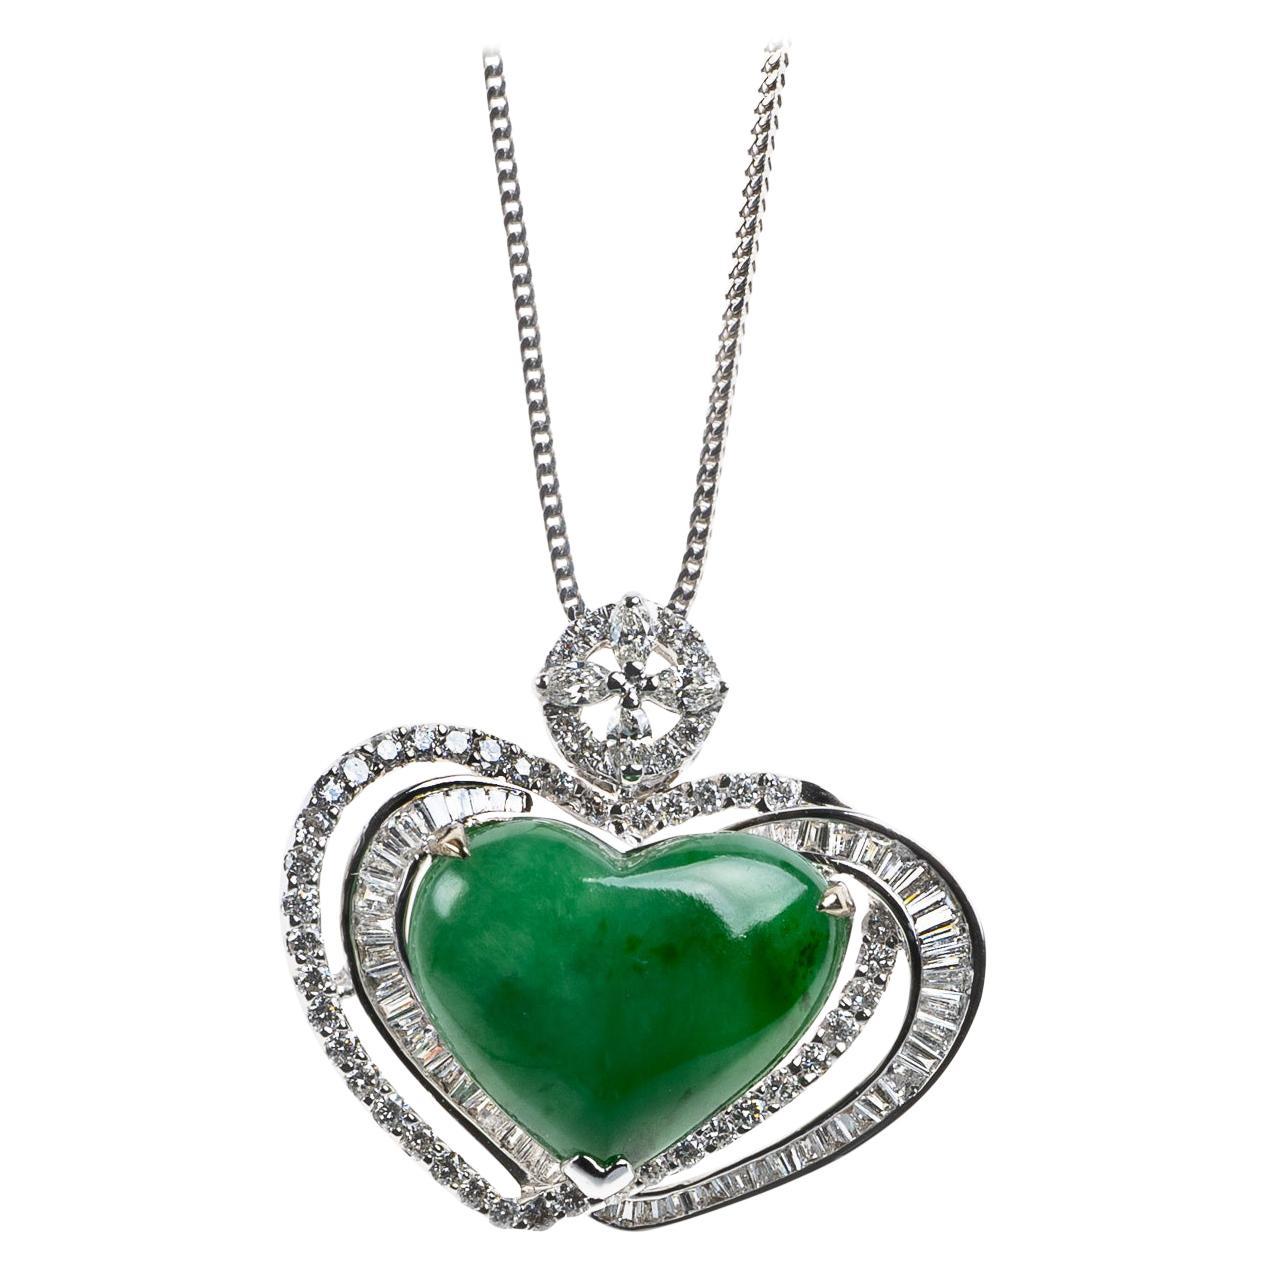 Green Jadeite Jade Heart Cabochon and Diamond Pendant, Certified Untreated